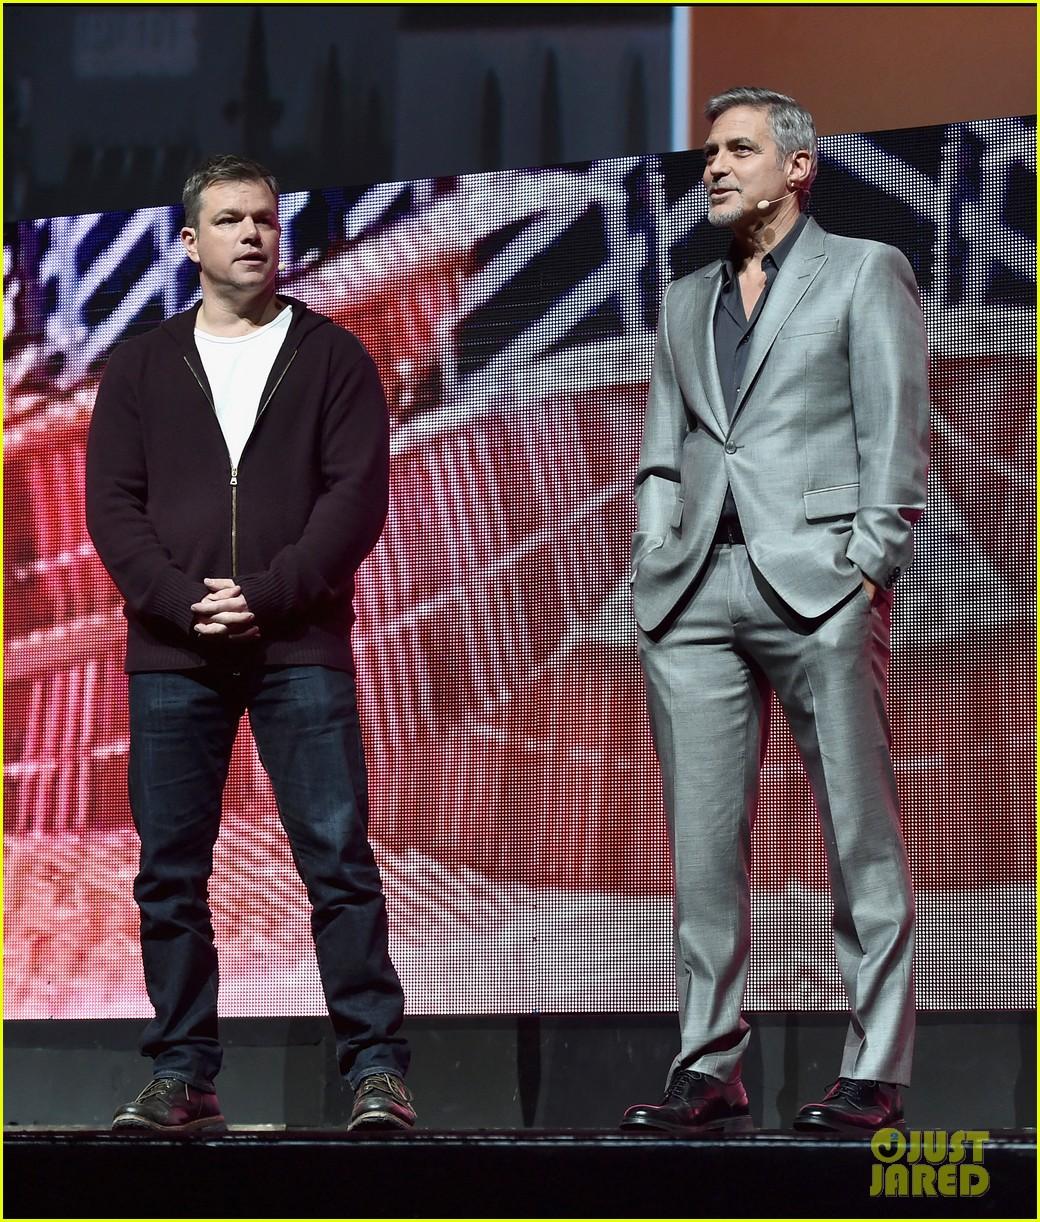 George Clooney at CinemaCon presenting Suburbicon George-clooney-julianne-moore-matt-damon-cinemacon-2017-05